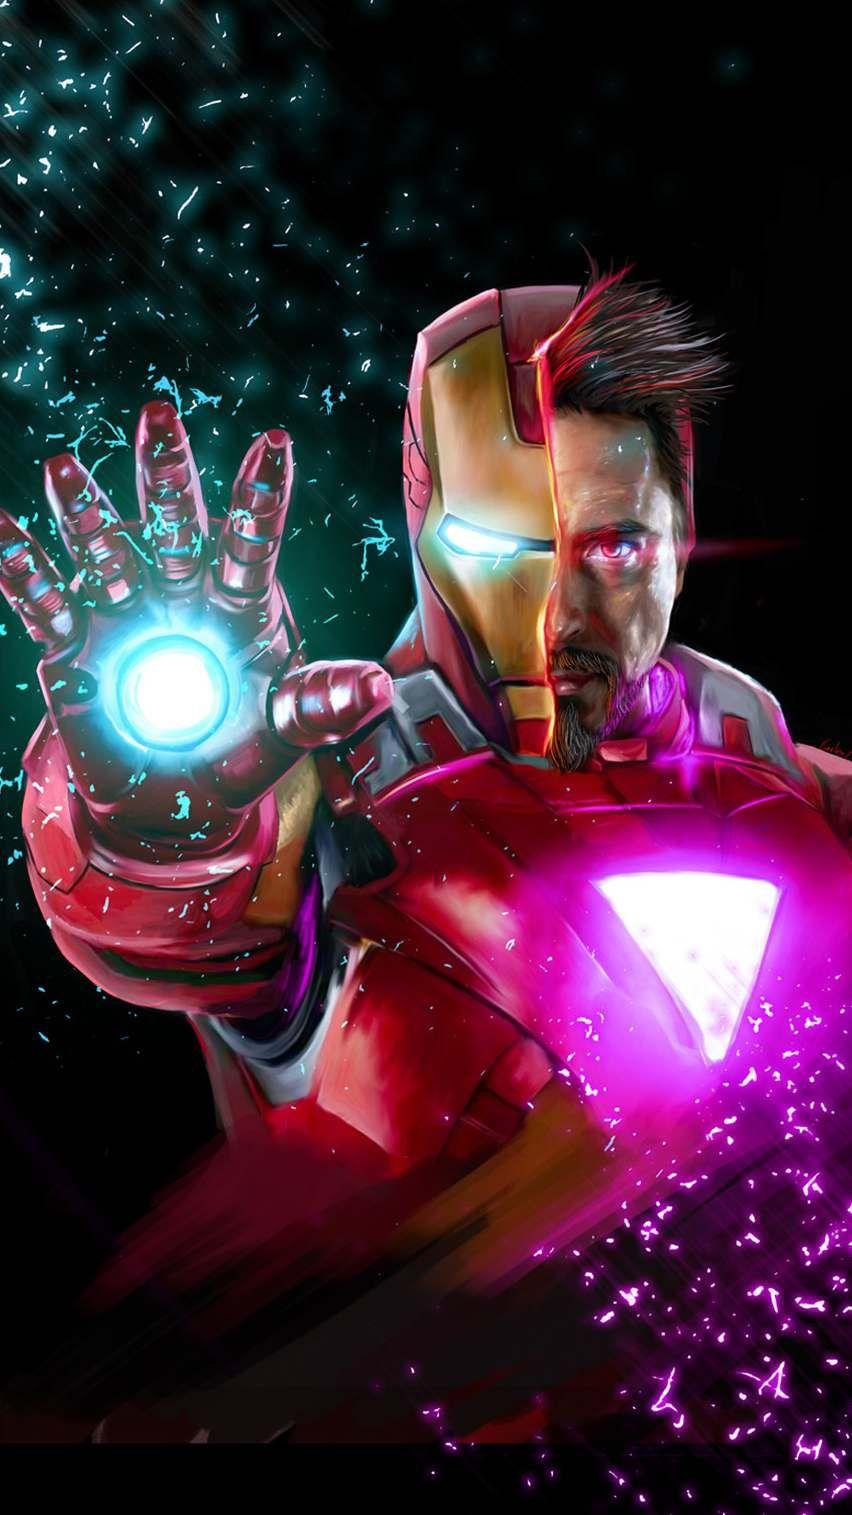 Avengers Endgame Tony Stark Iron Man iPhone Wallpaper Avengers 852x1515